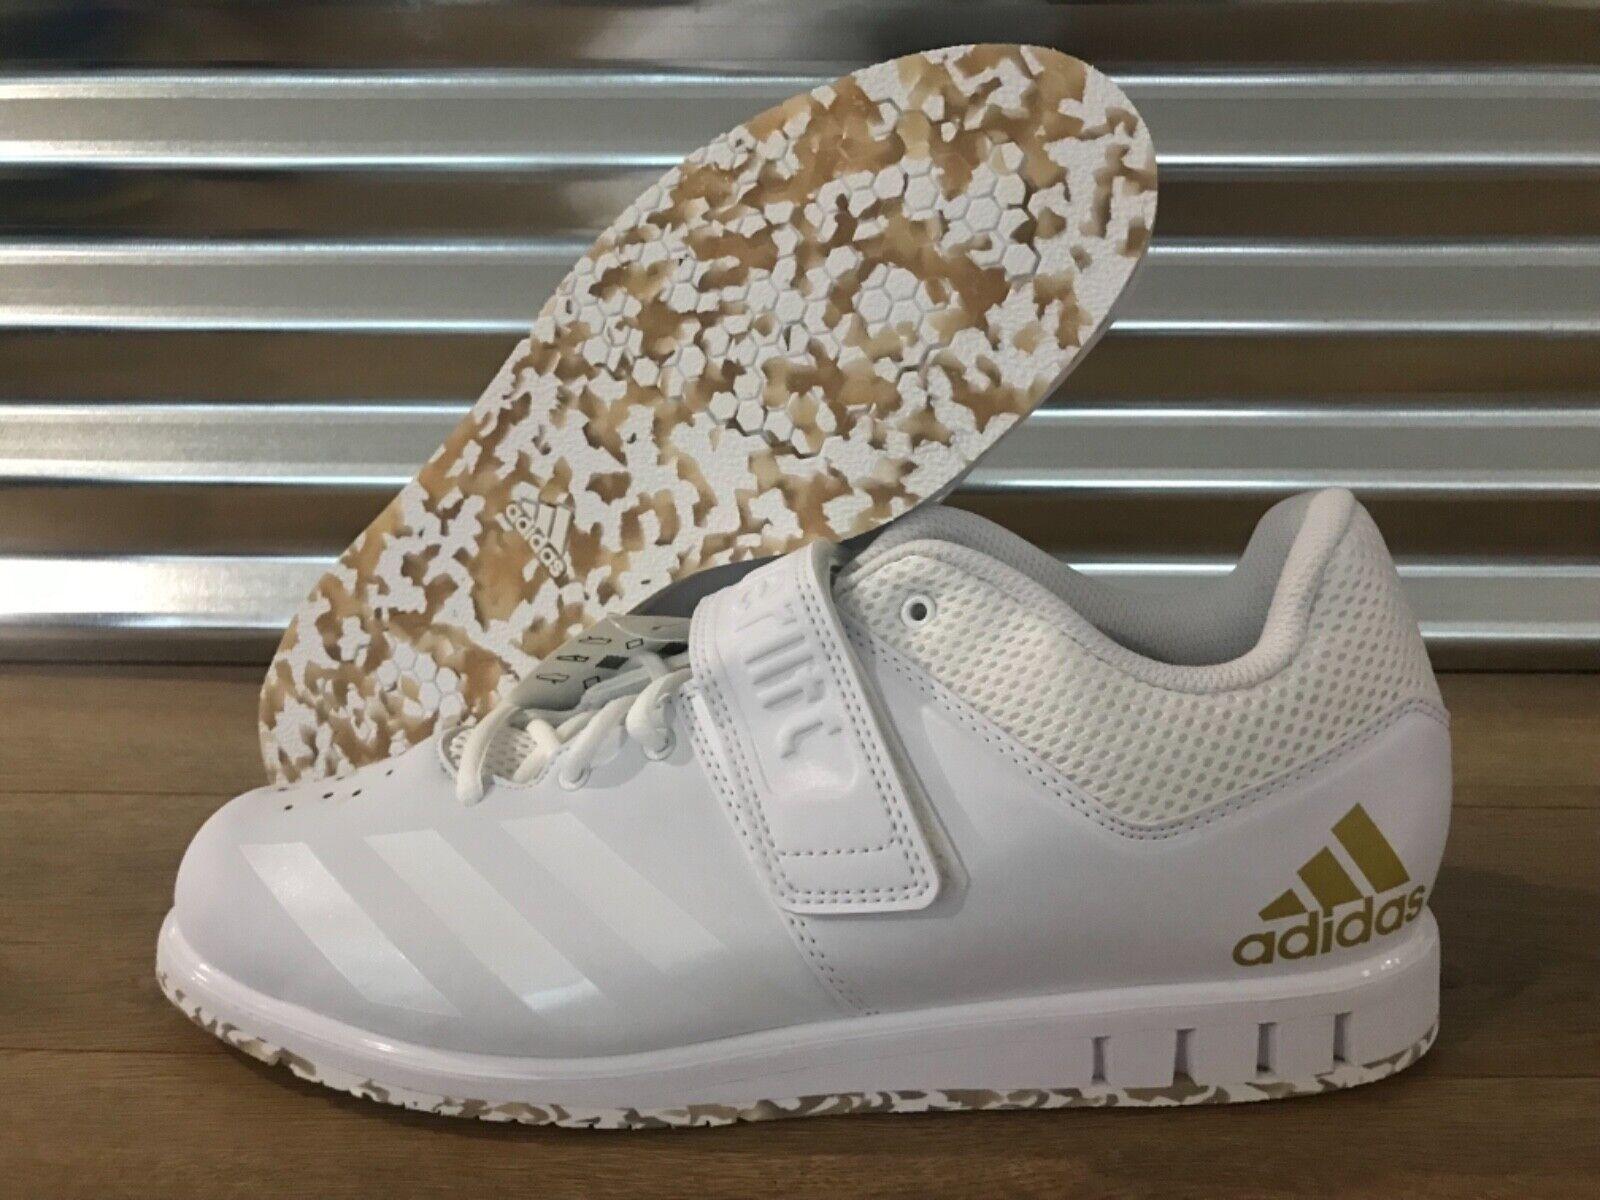 Adidas energialift 3.1 Weightlifting sautope Trainers bianca oro SZ ( AC7467 ) Sautope classeiche da uomo